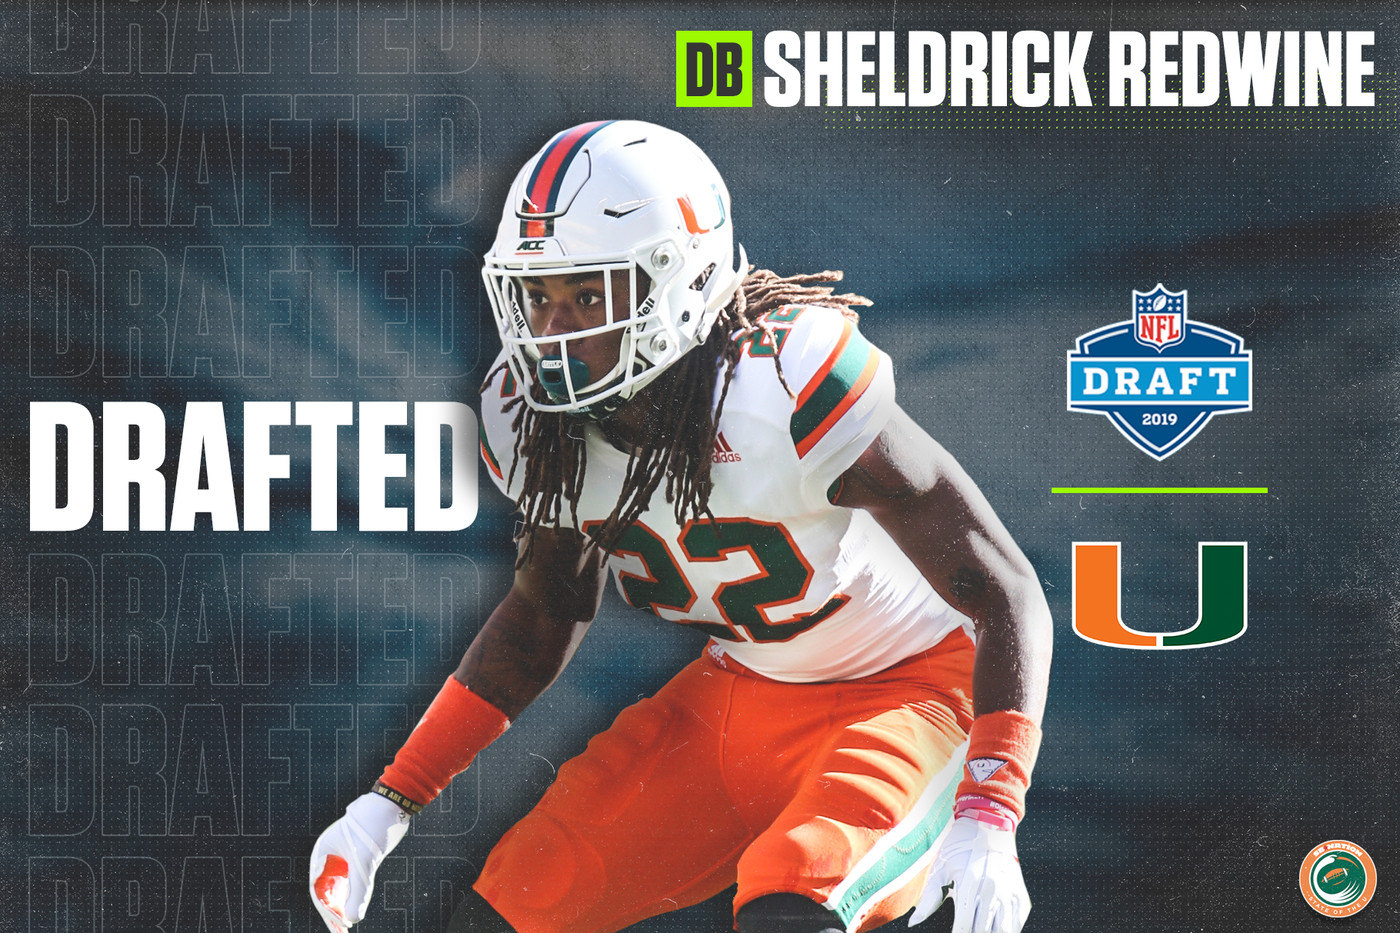 wholesale dealer 165f1 b1e7c 2019 NFL Draft: Miami DB Sheldrick Redwine Selected by the ...